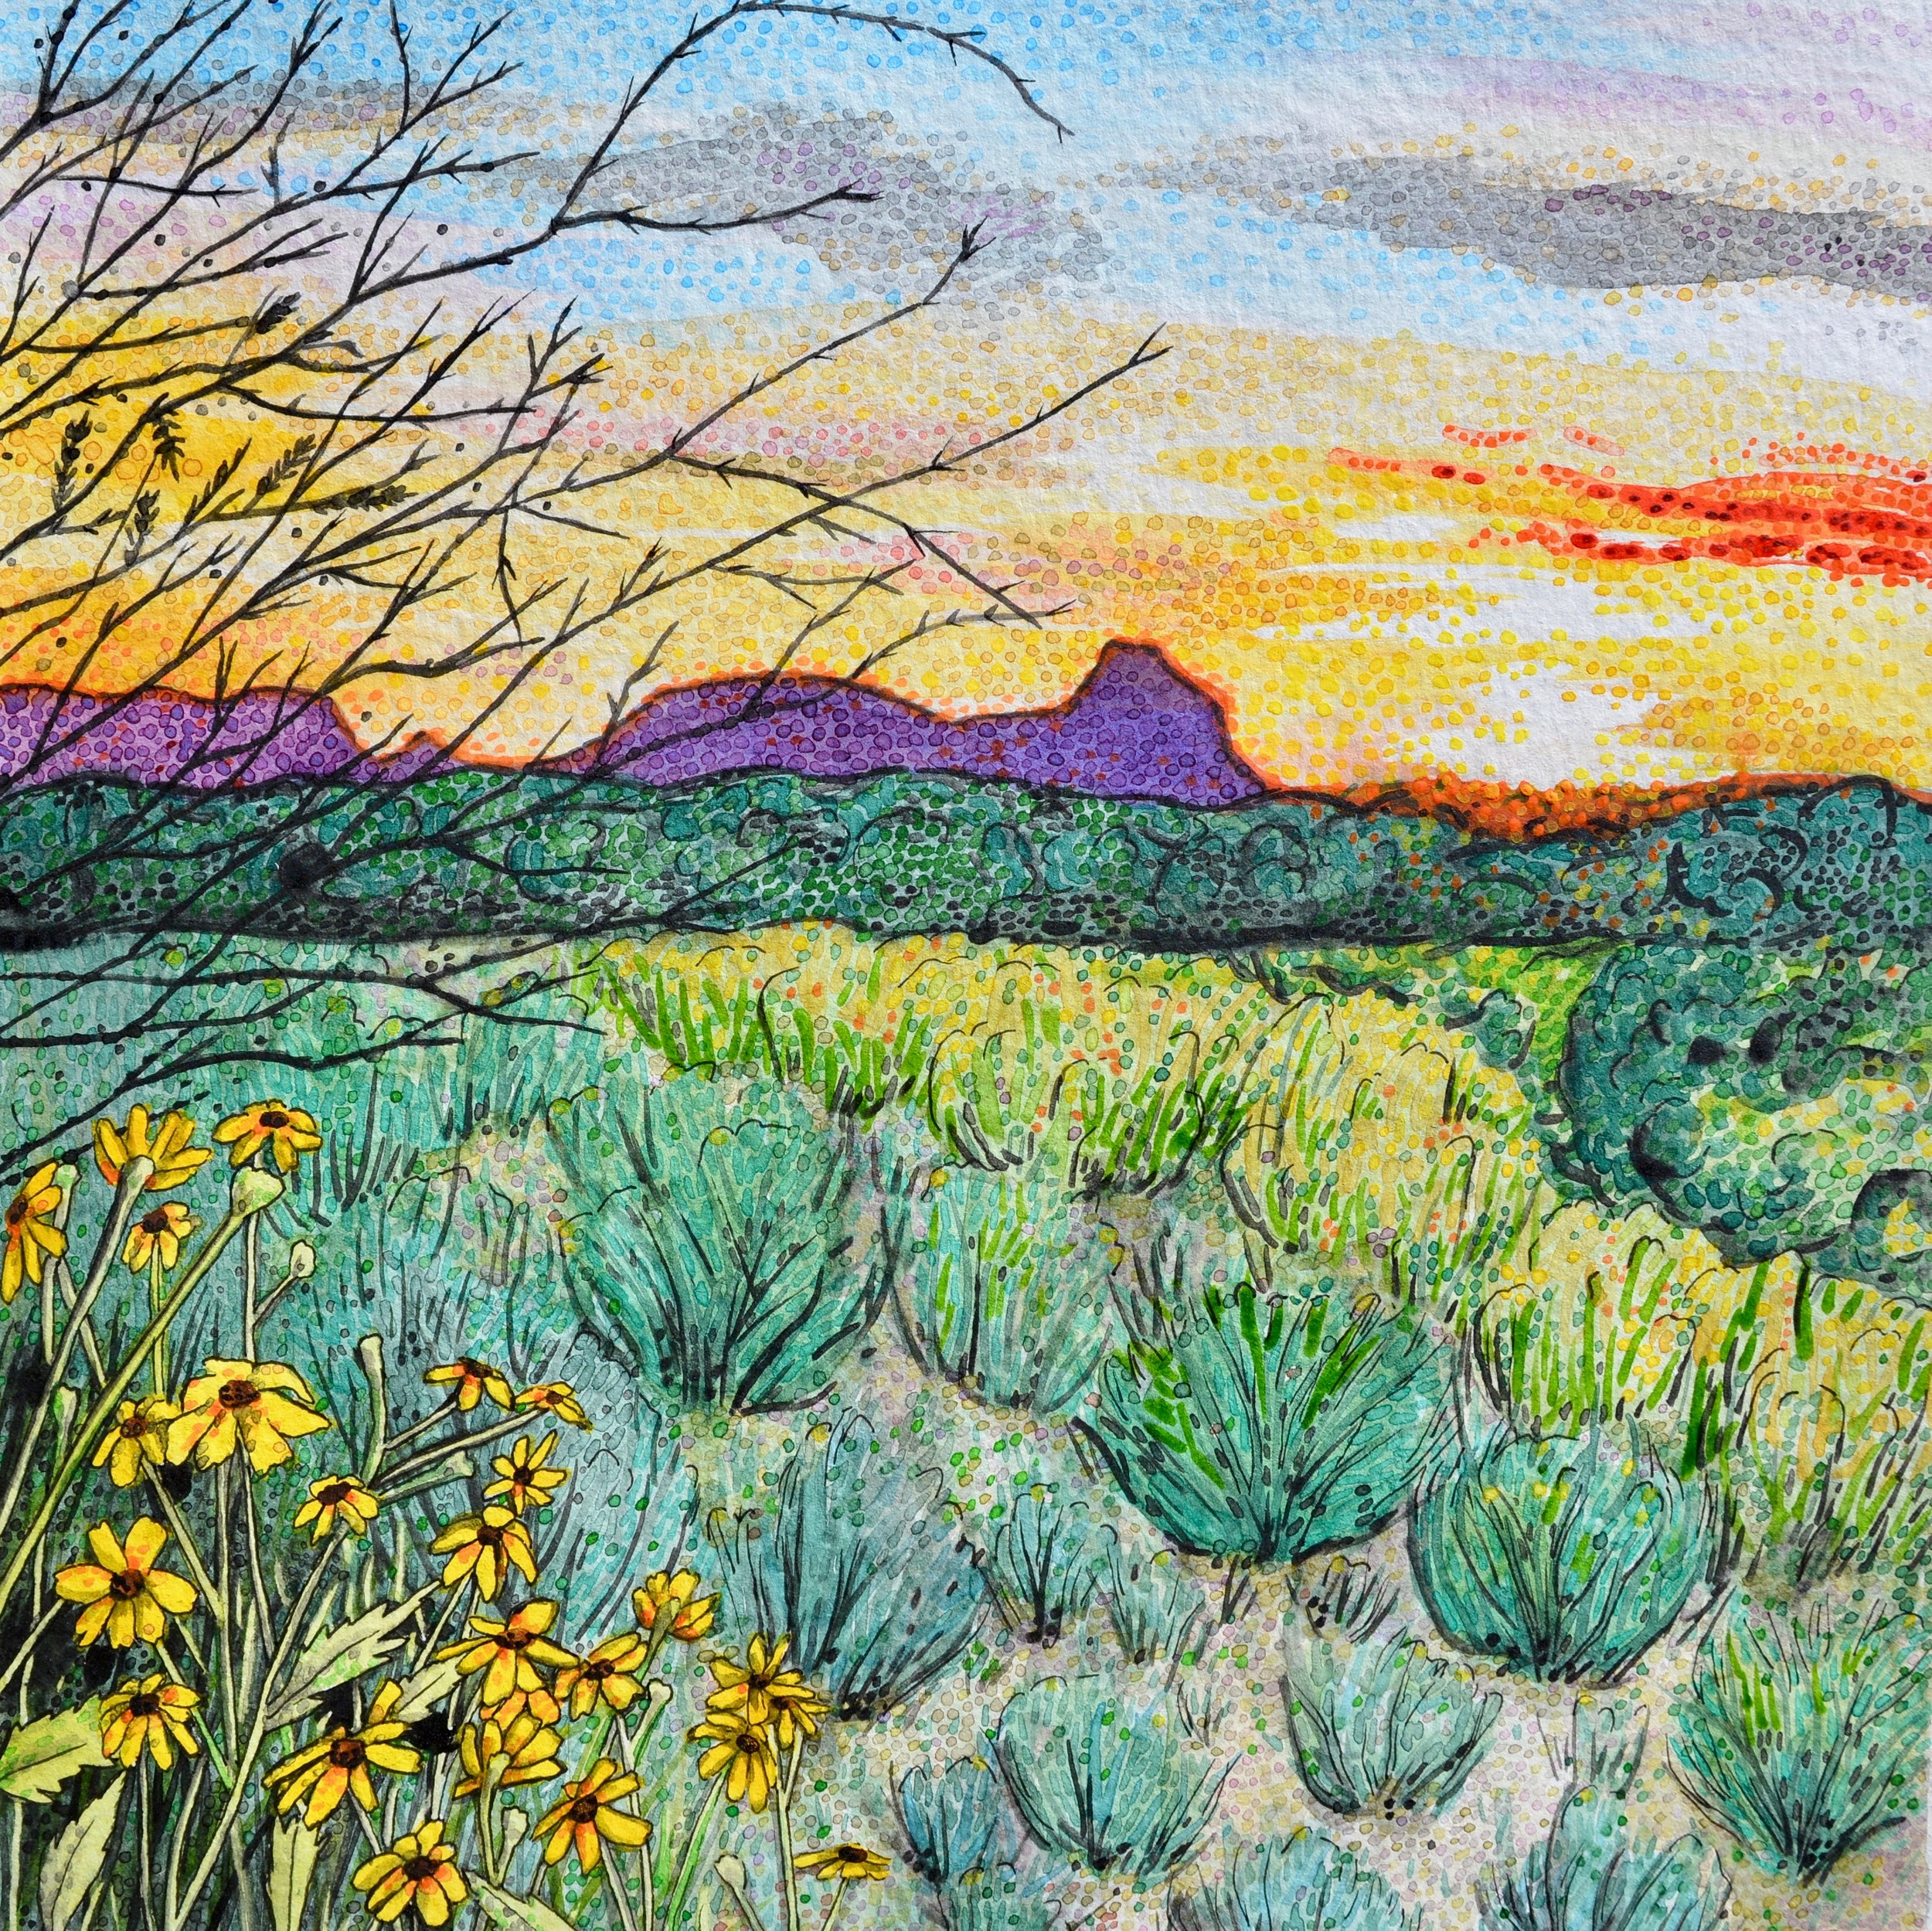 Casas Adobes, Arizona: 3/19/18, 18:34:44